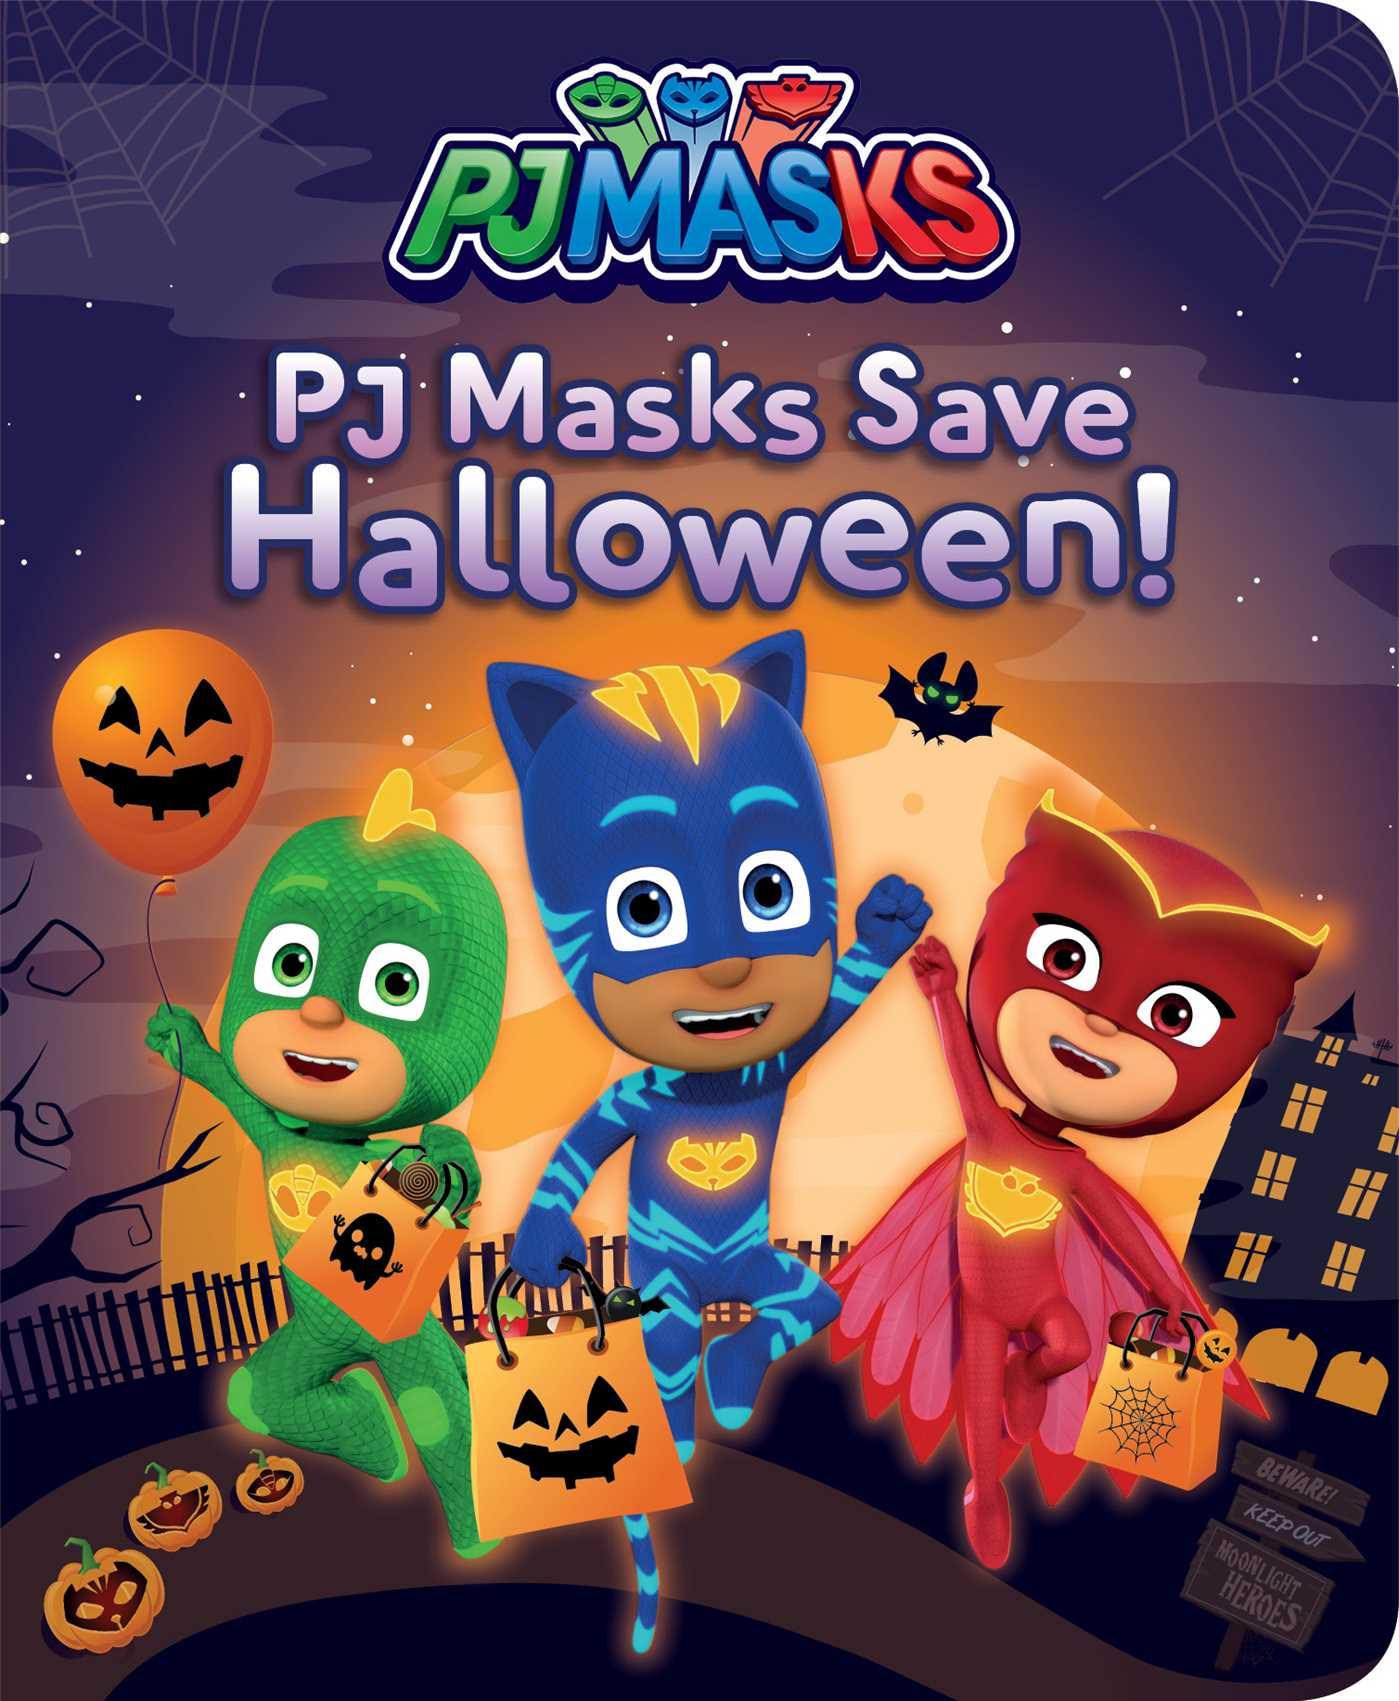 Cover Image of PJ Masks Save Halloween!